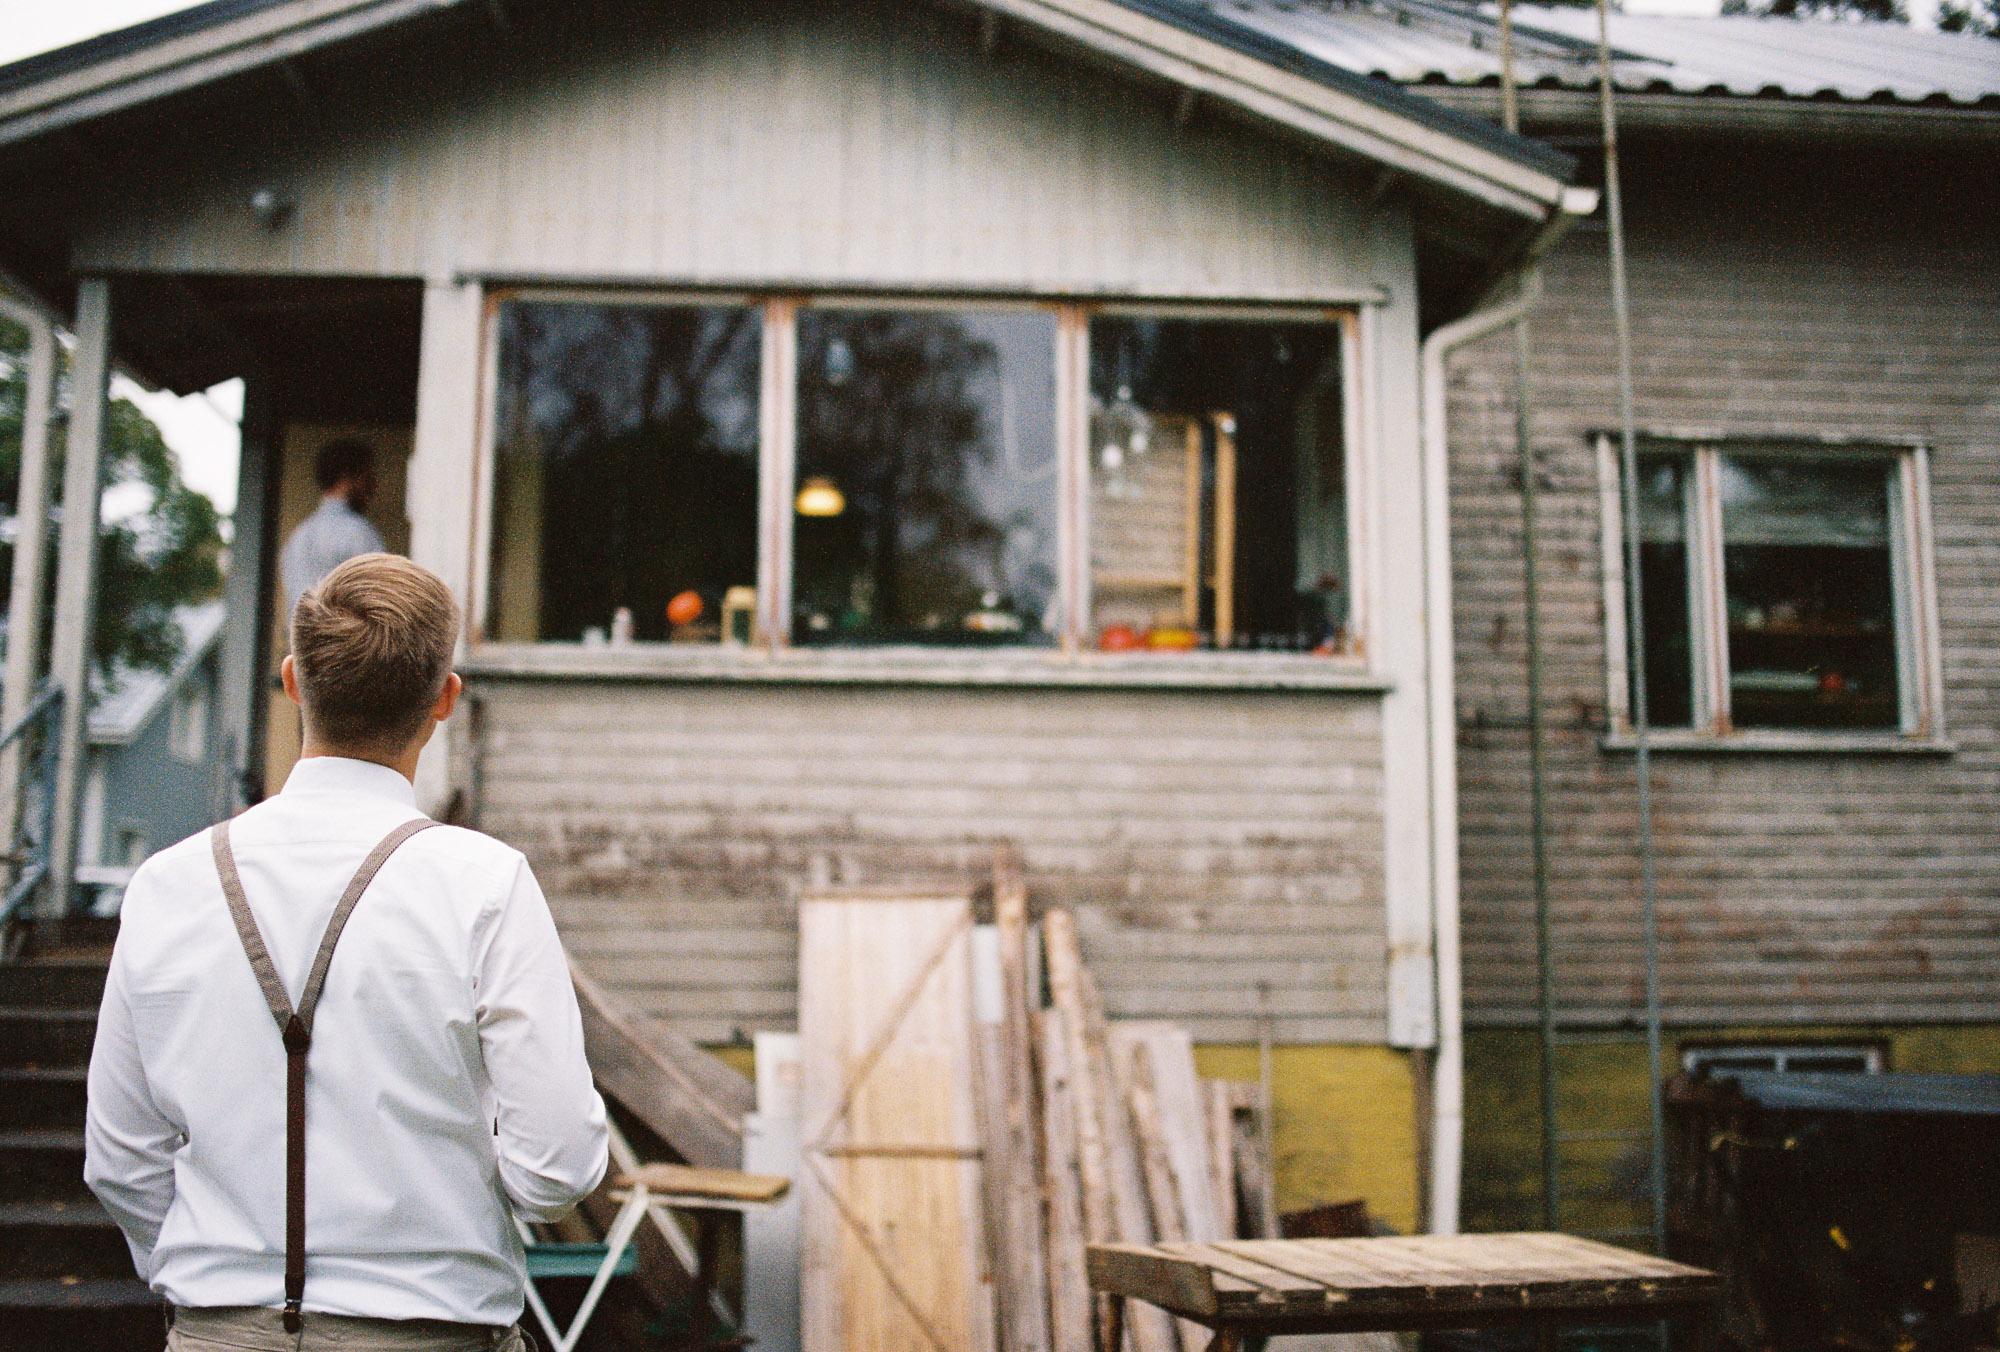 jere-satamo-analog-film-wedding-photographer-finland-049.jpg